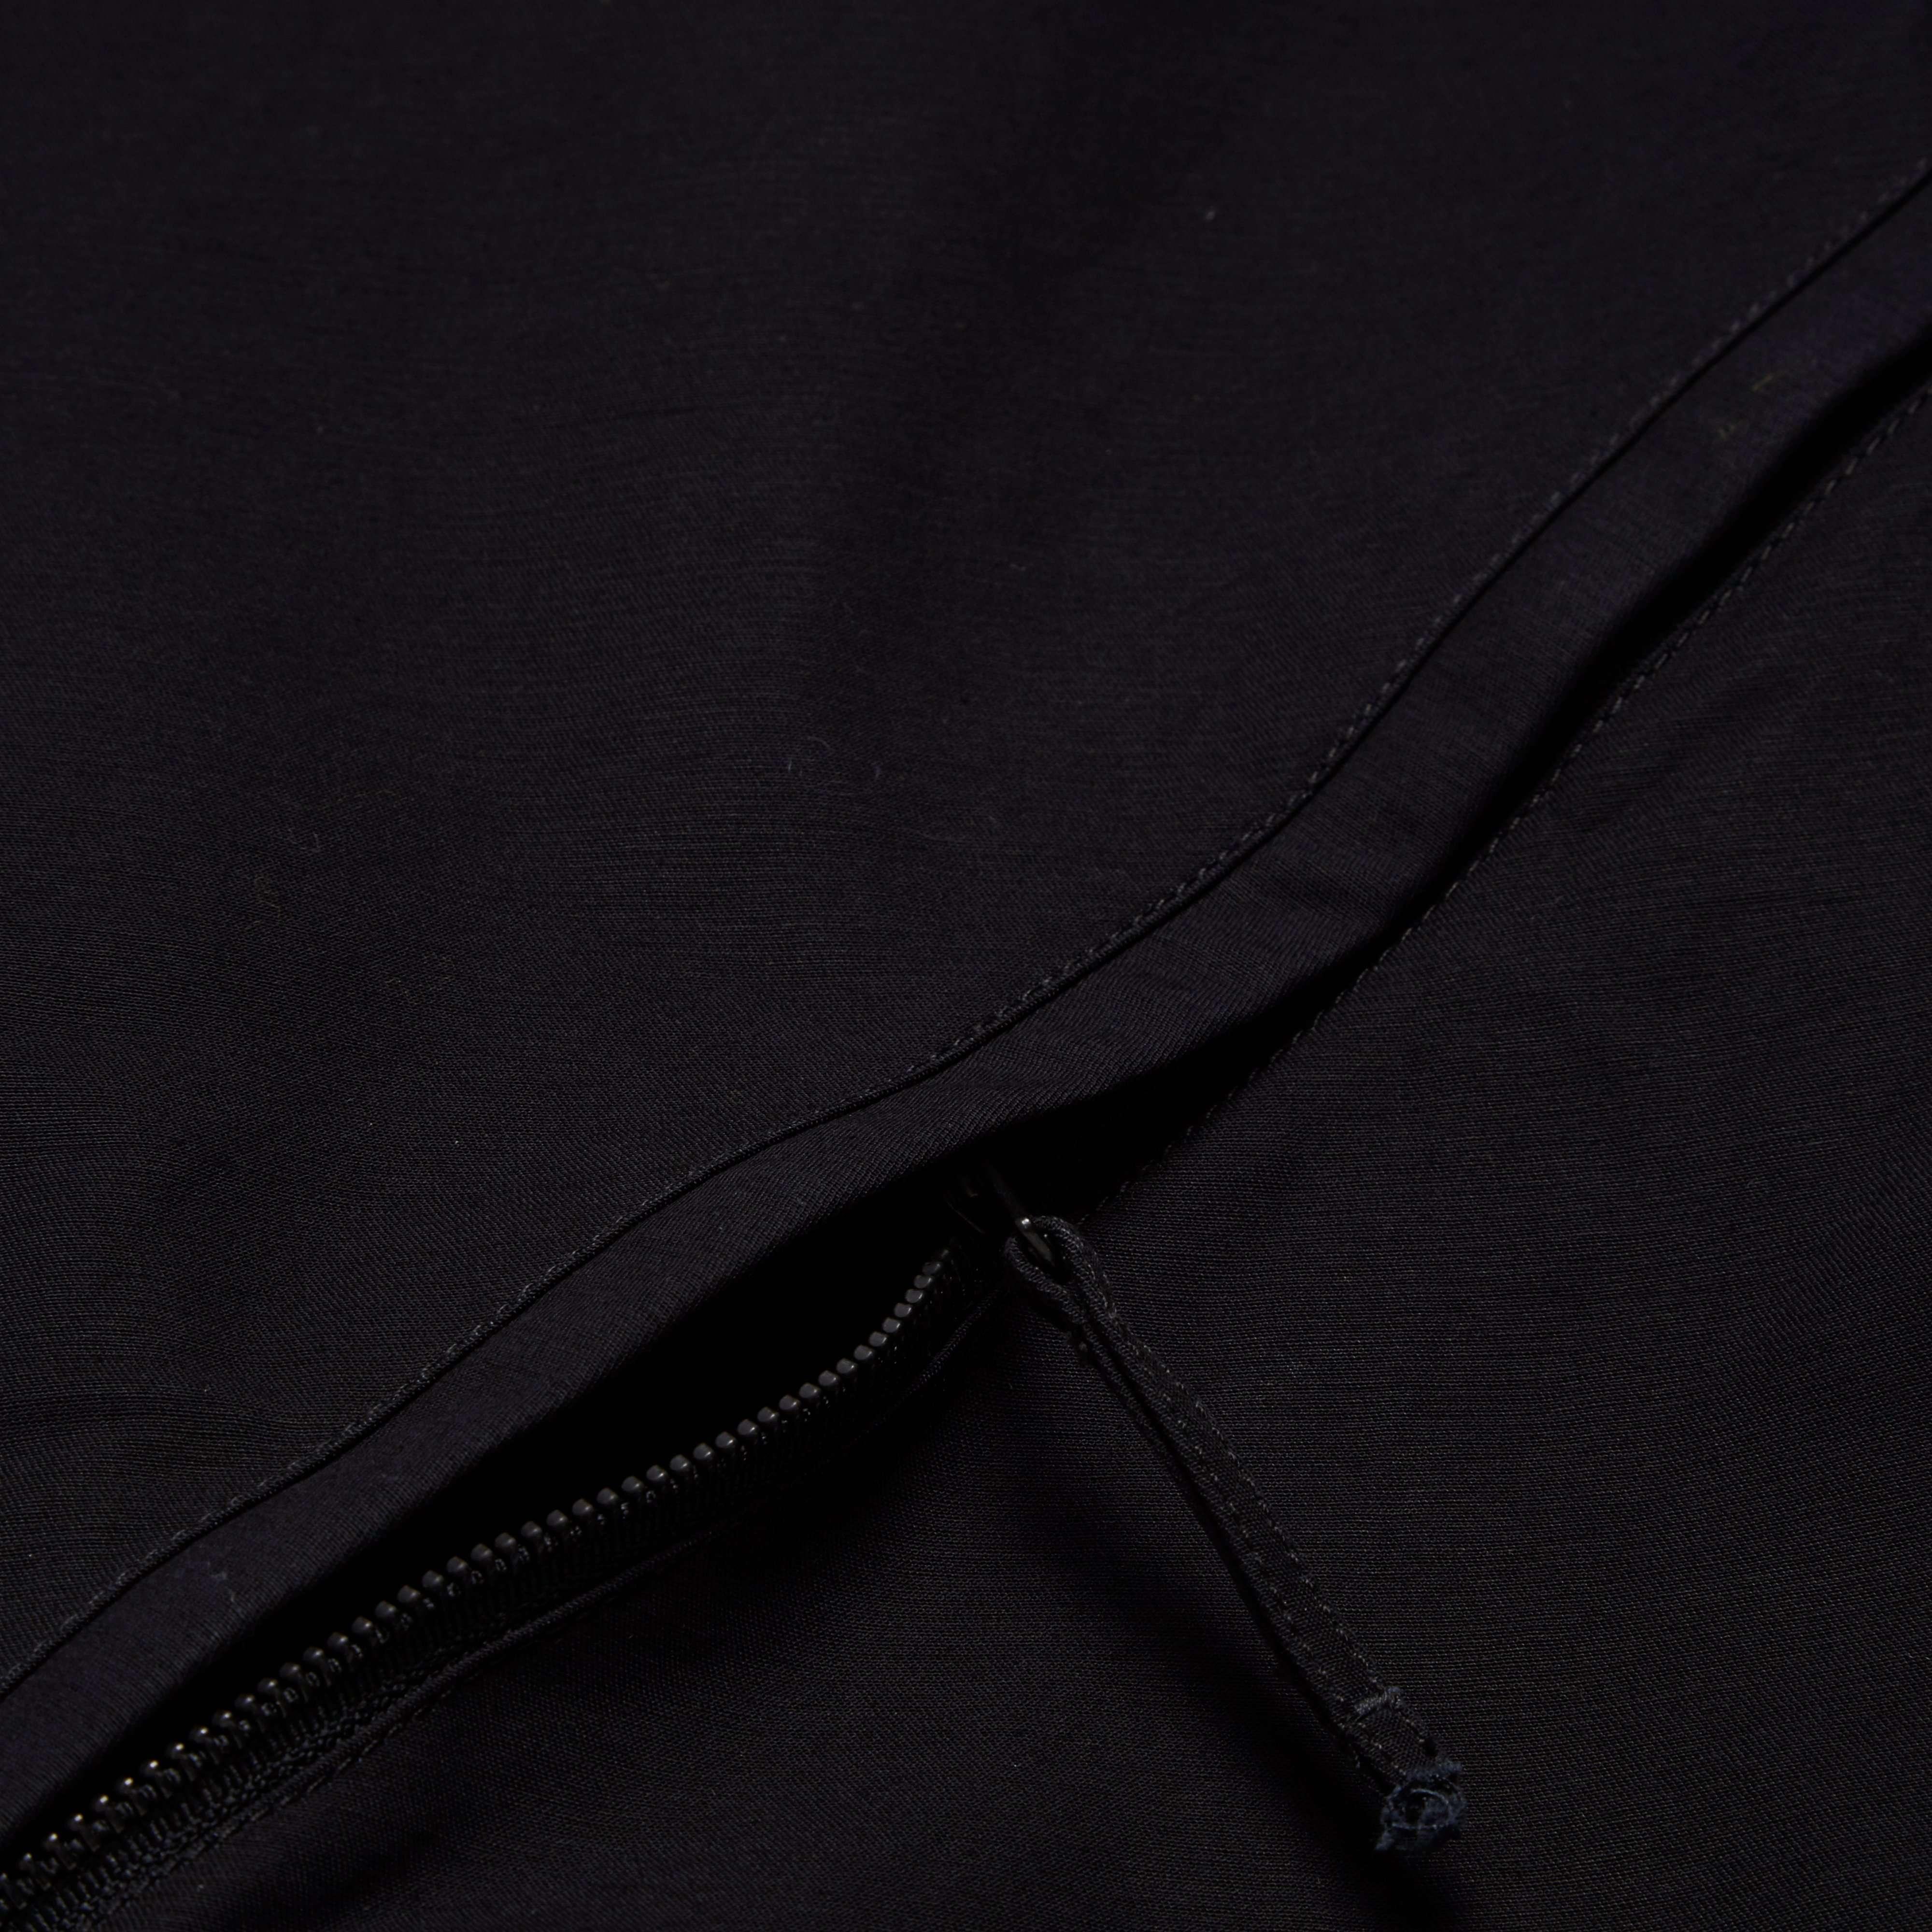 Engineered Garments NA2 Jacket - Cotton Double Cloth